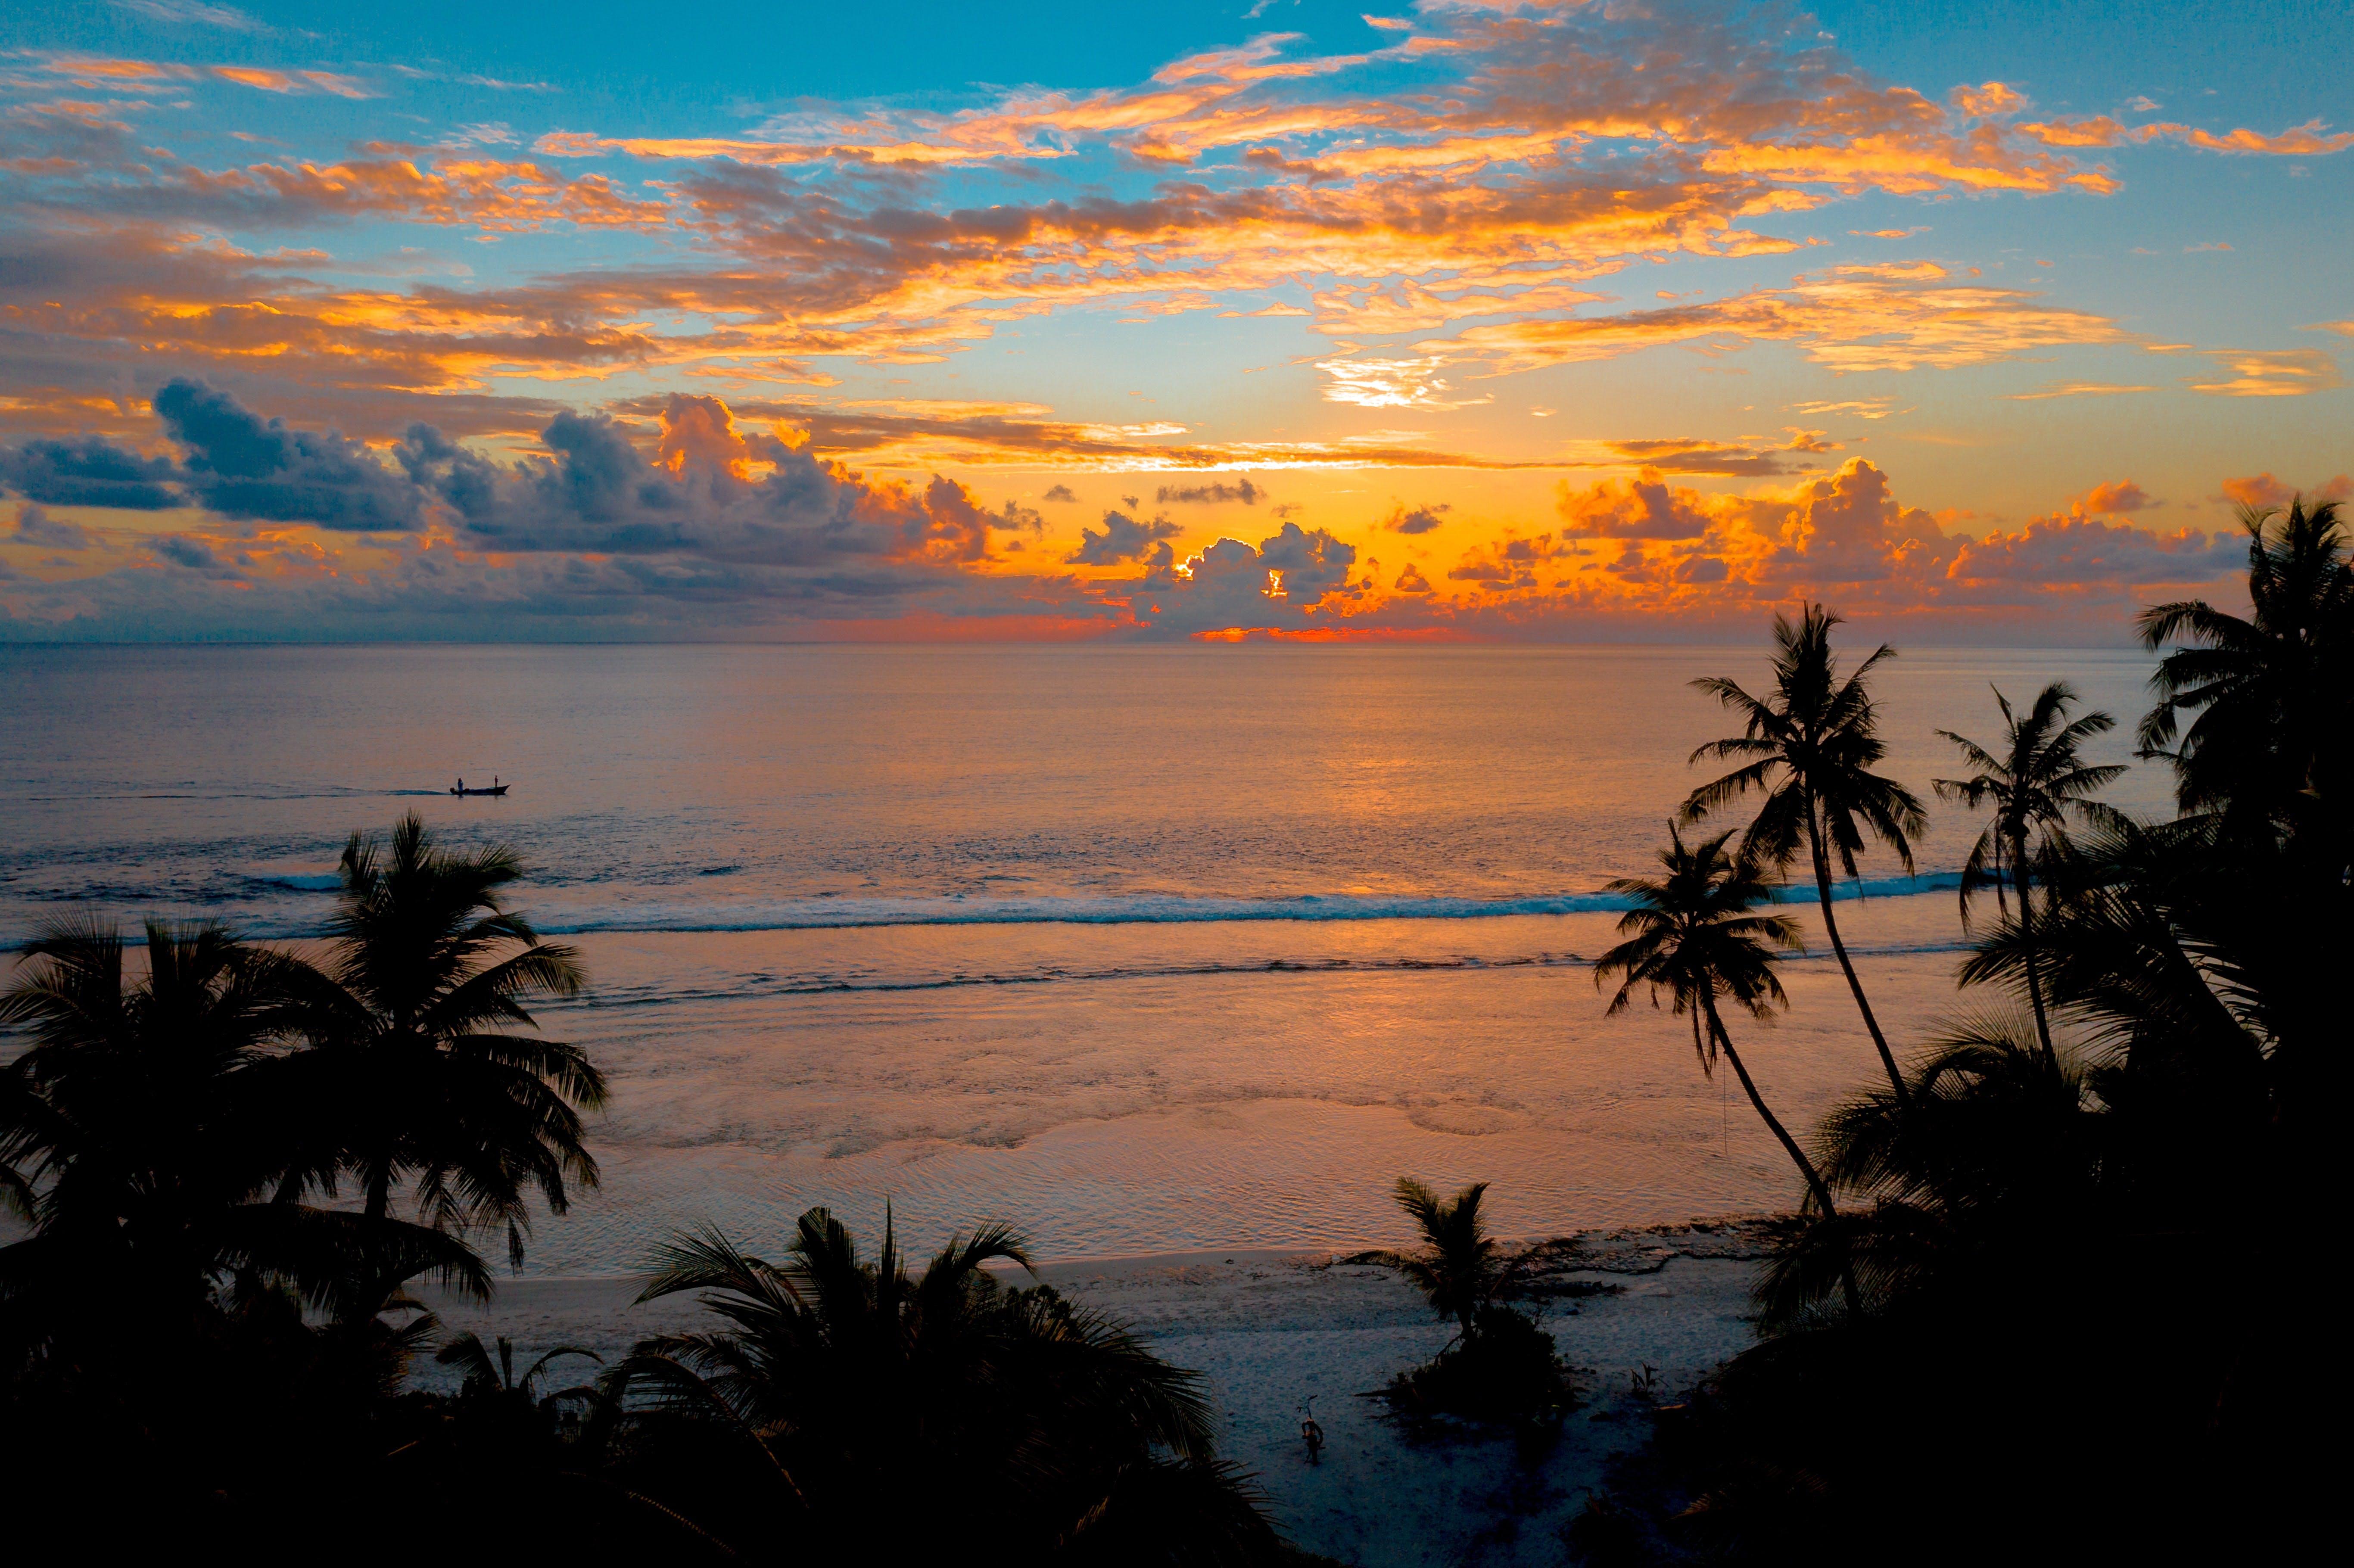 Island sunset over ocean.